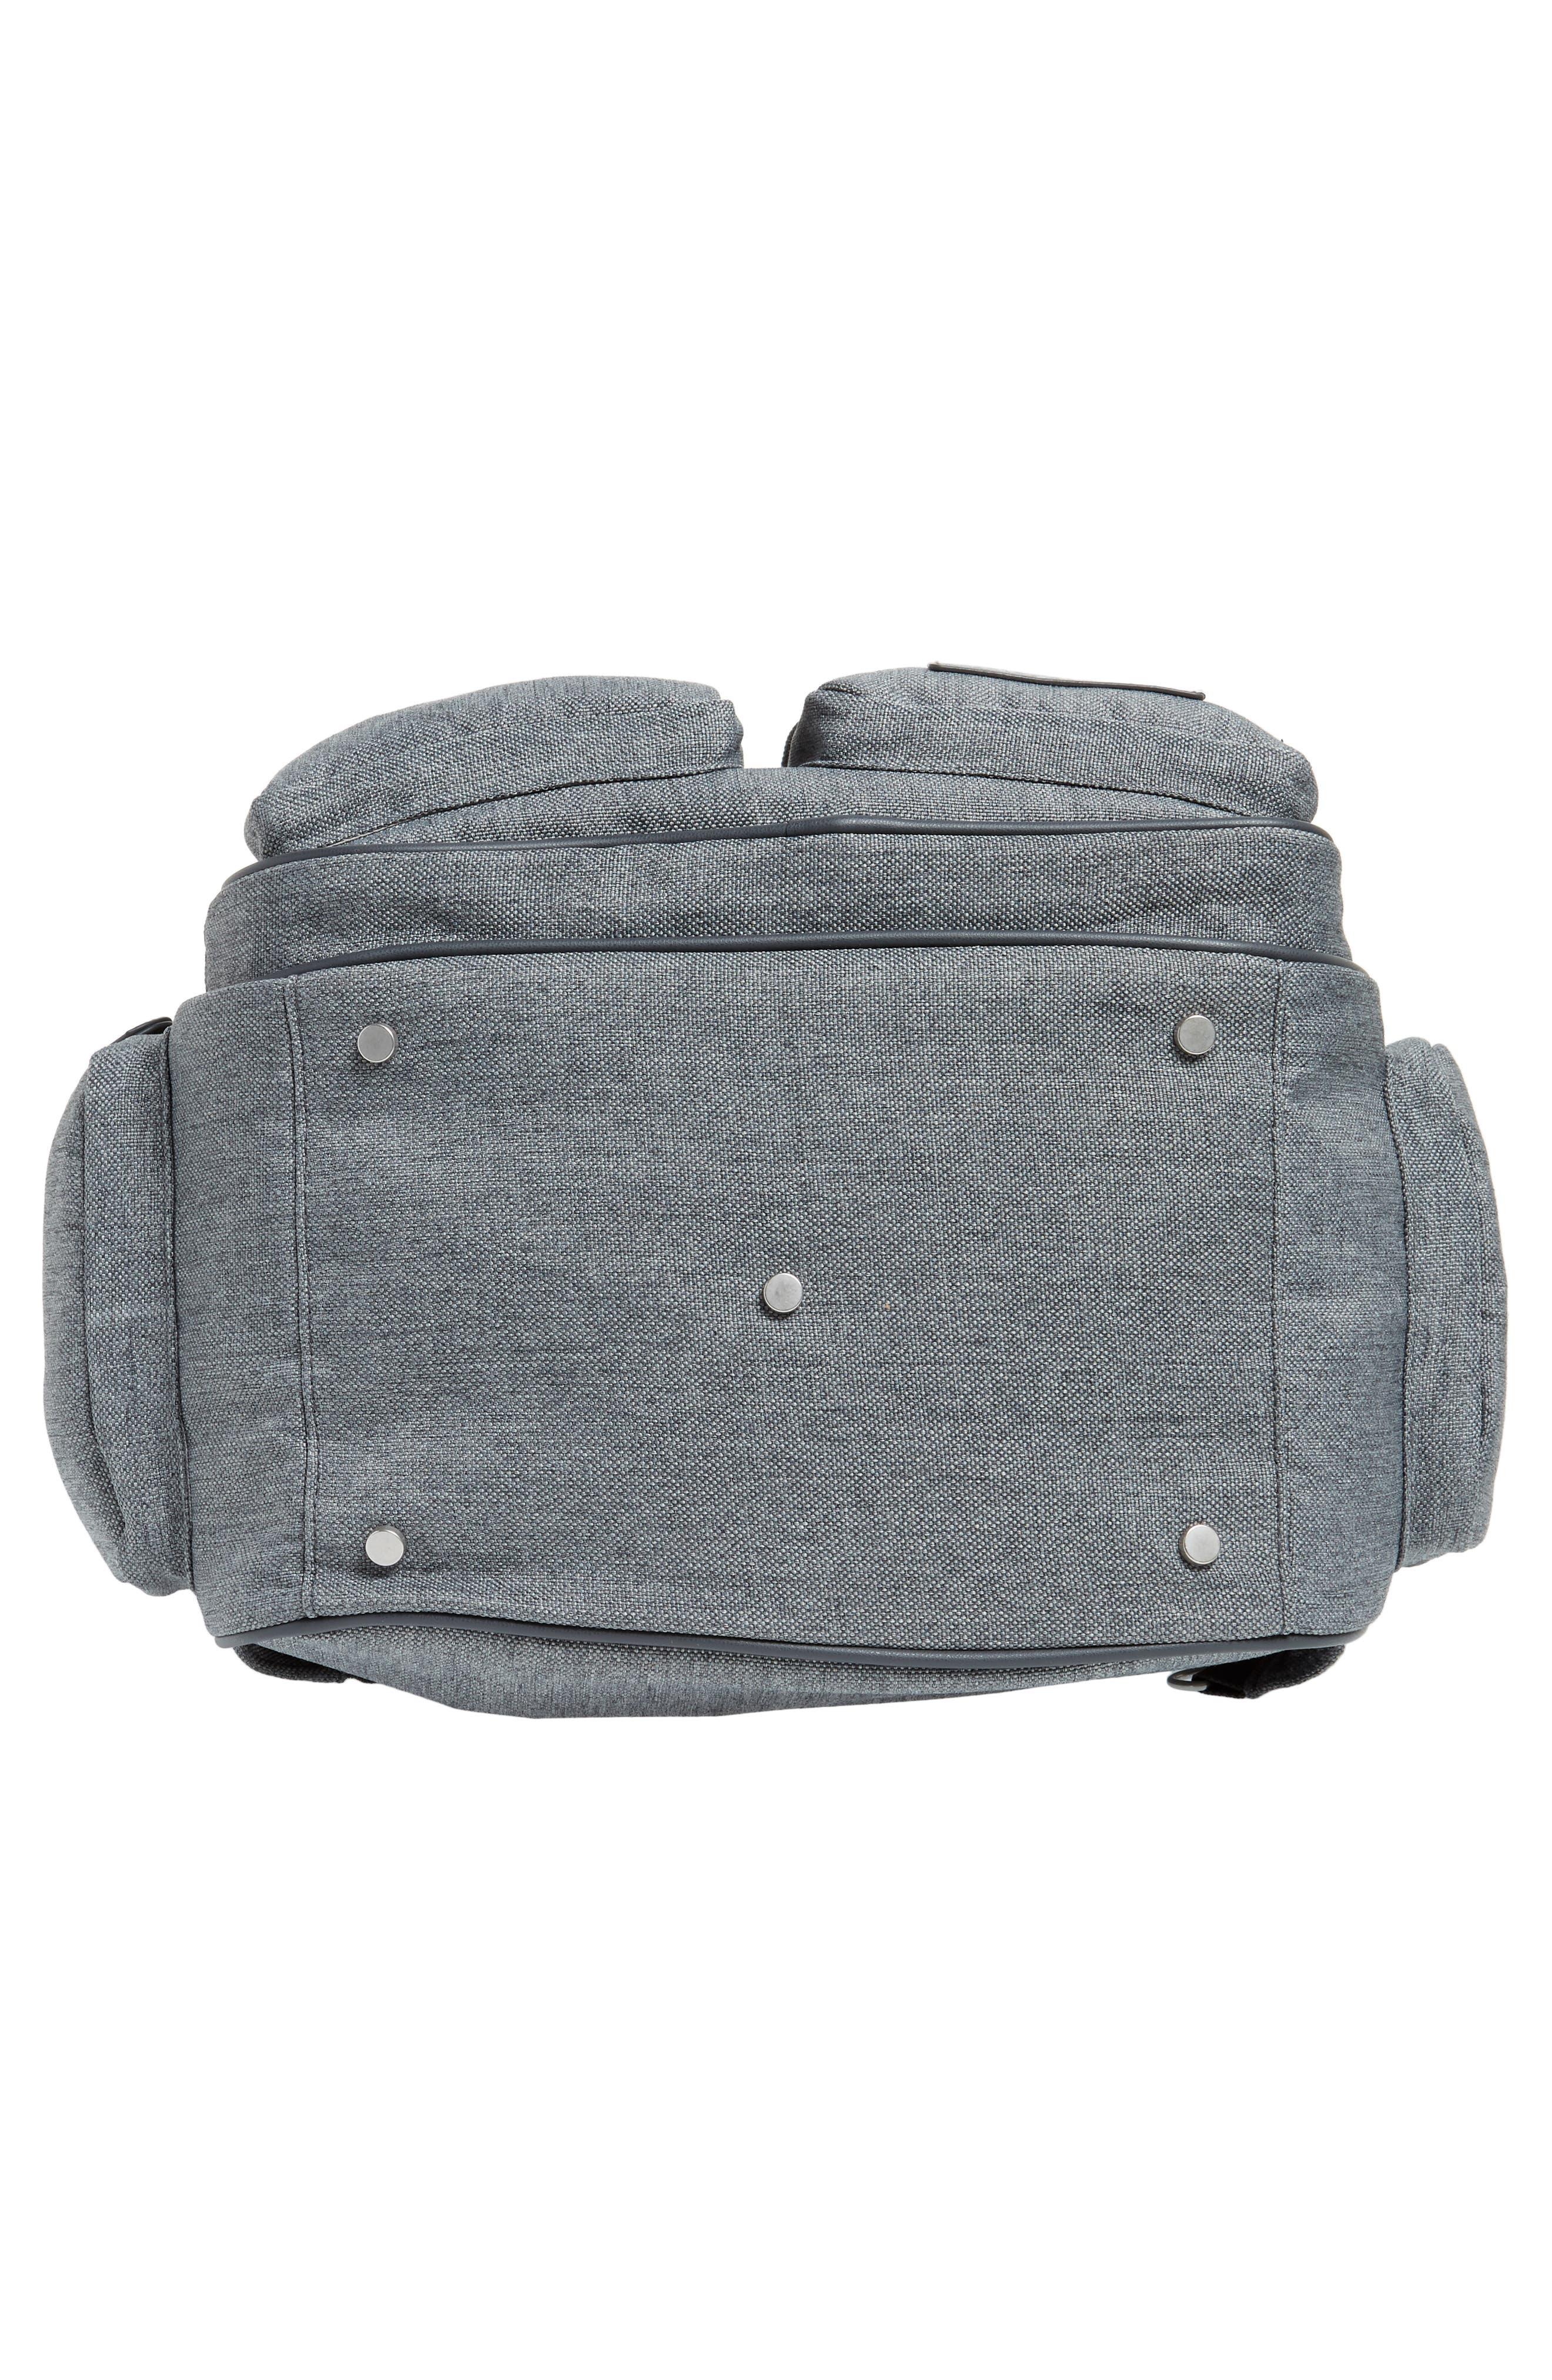 Glober Water Resistant Diaper Backpack,                             Alternate thumbnail 7, color,                             SMOKEY